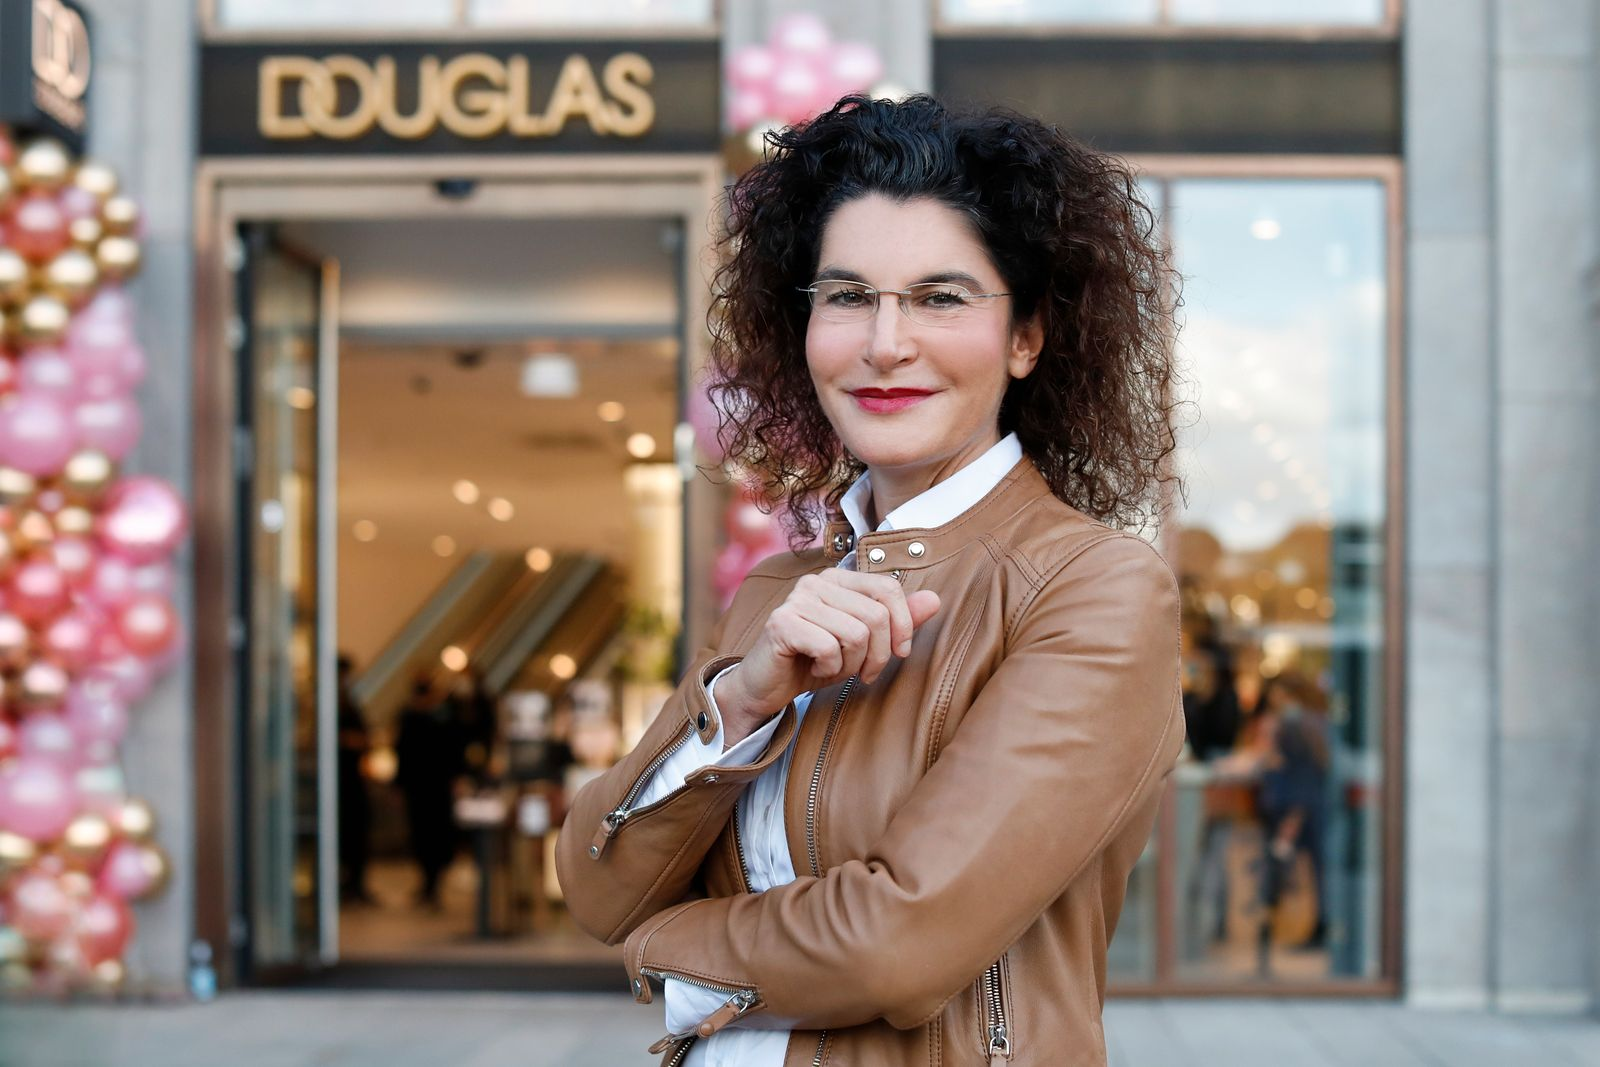 Douglas Luxury-Flagship-Store Opening In Hamburg